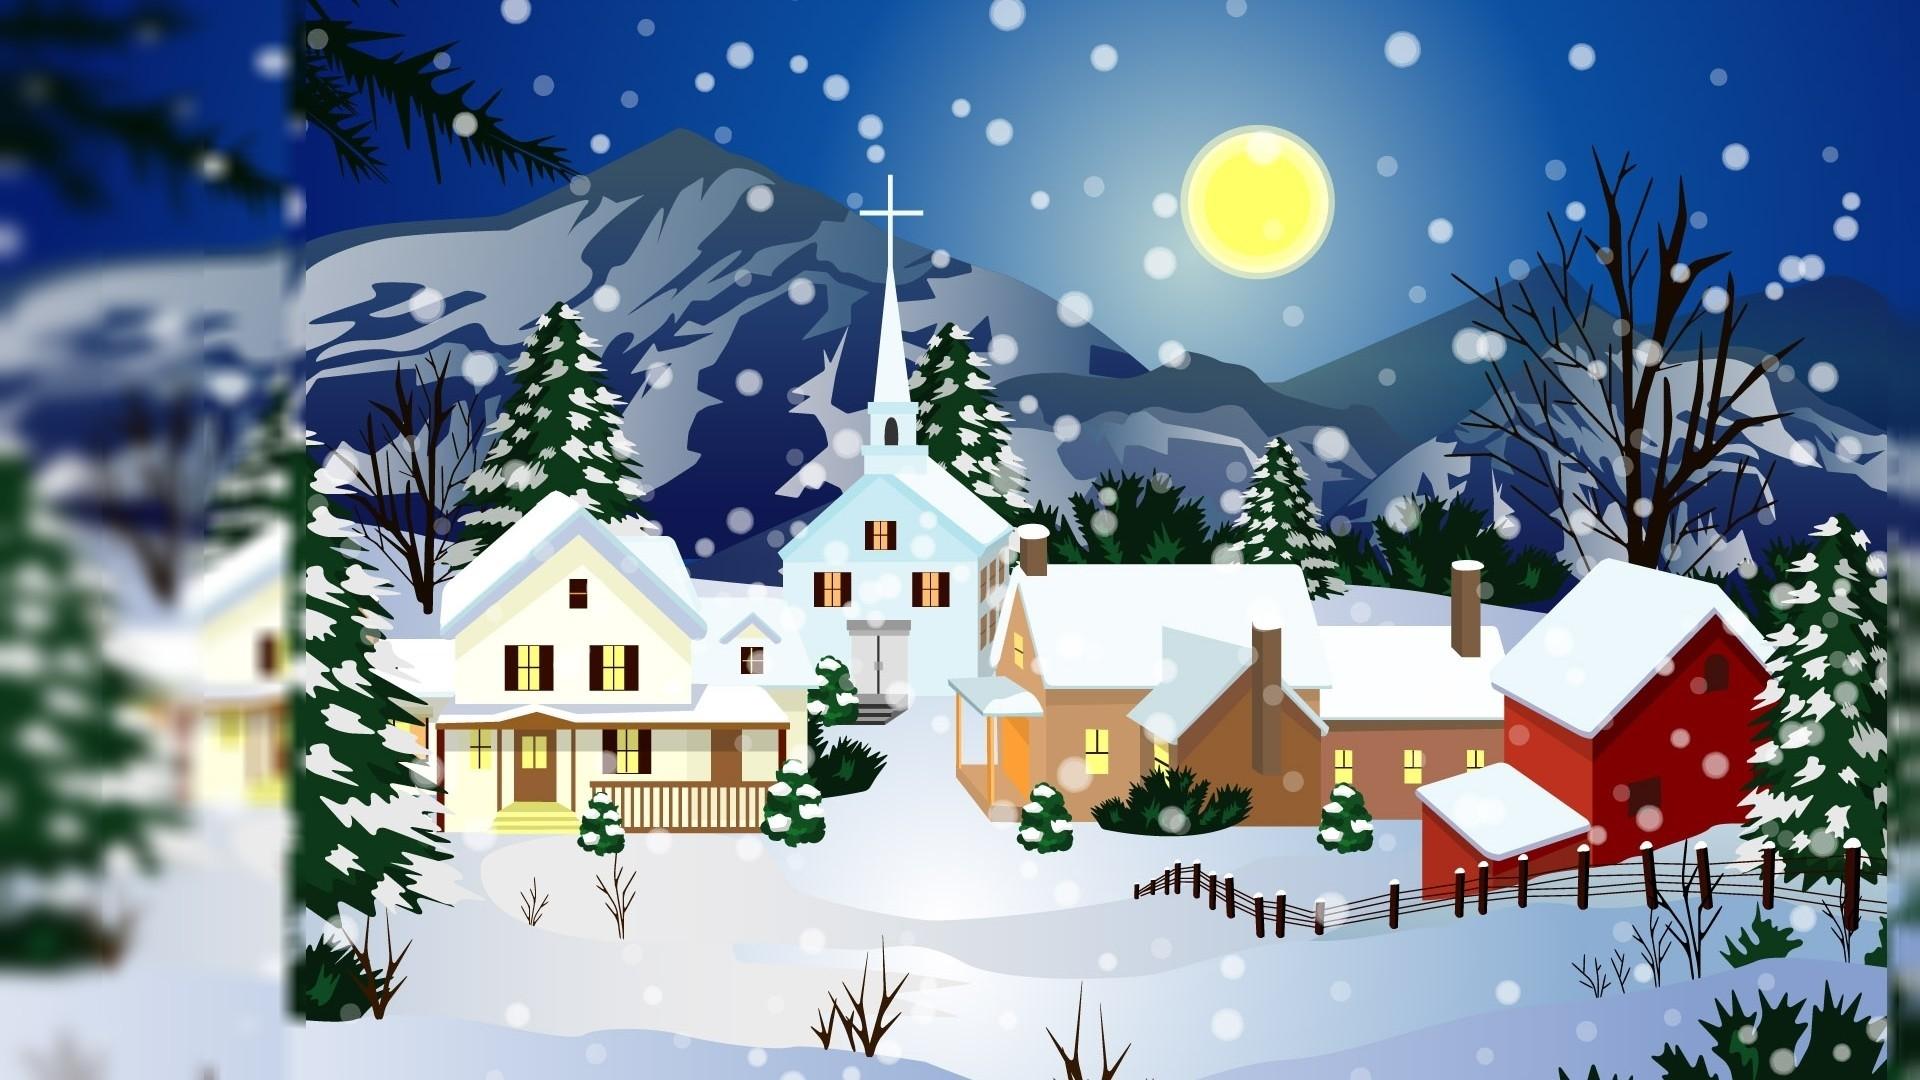 Res: 1920x1080, New Desktop Wallpapers Christmas Animated Download - Animated Christmas  Wallpapers